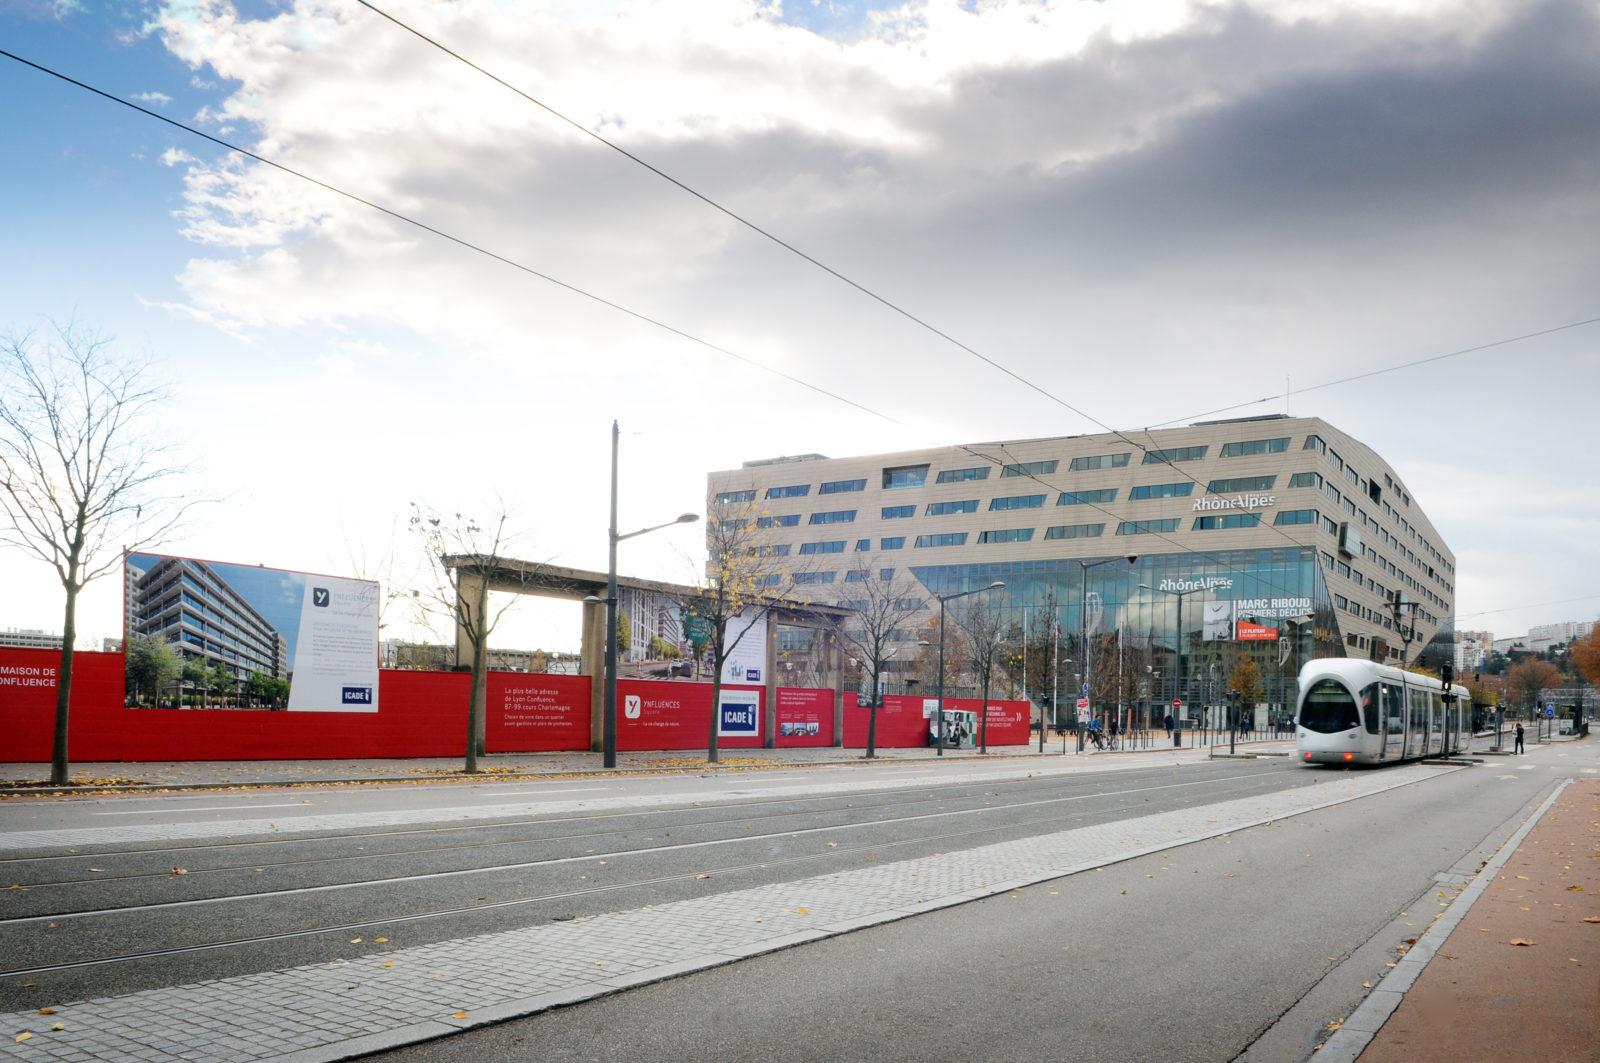 Palissade de chantier cisalame avec covering Lyon Congfluence pour Icade